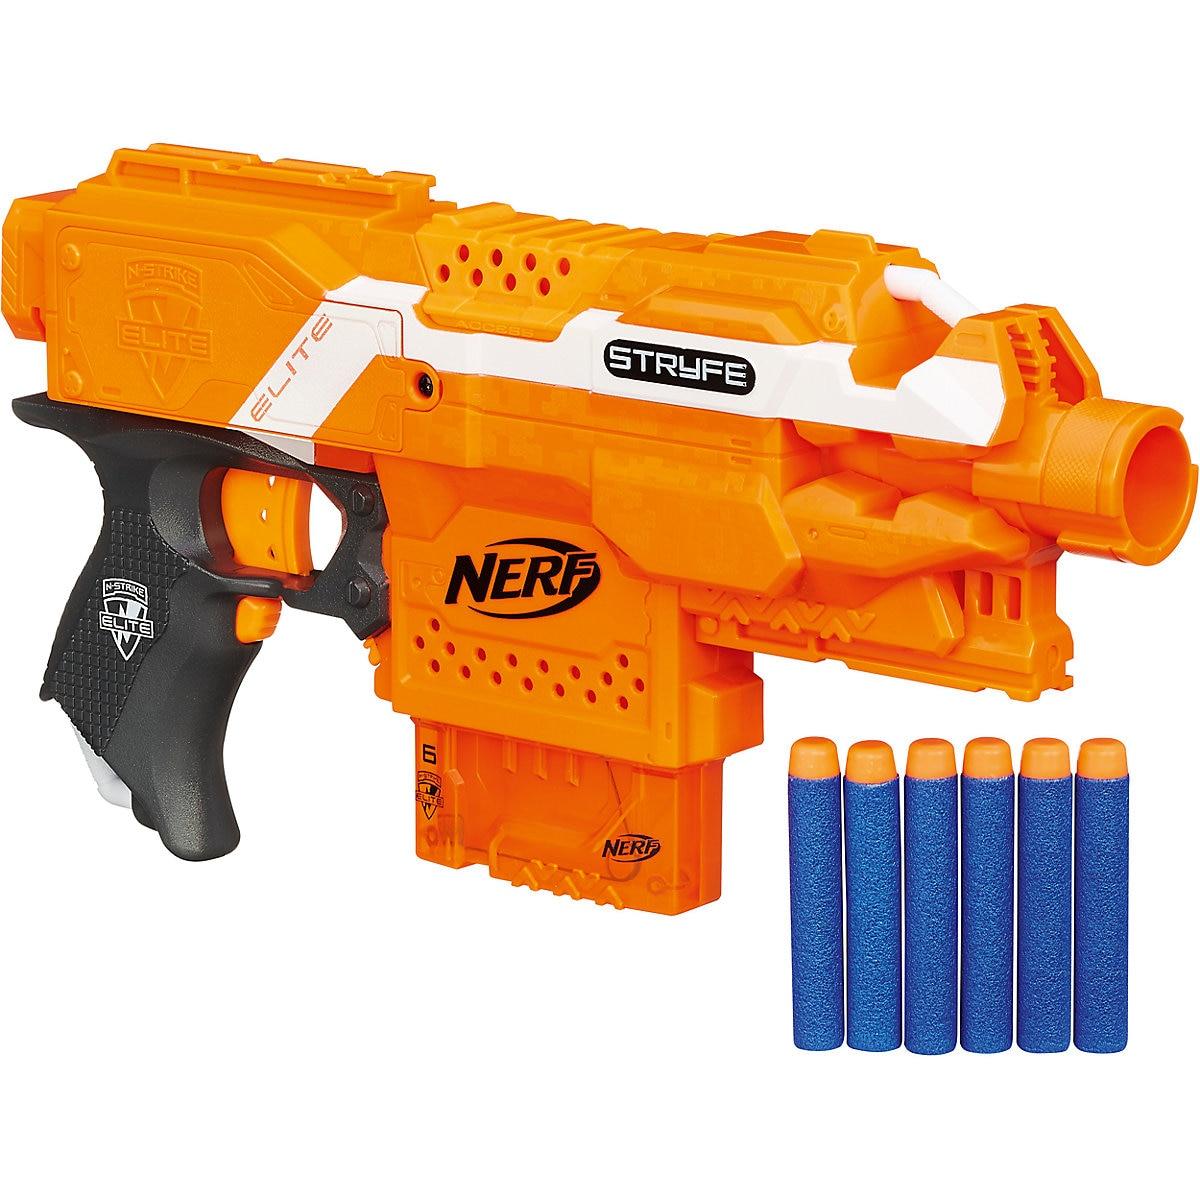 NERF jouet pistolets 2624497 pistolet arme jouets jeux pneumatique blaster garçon orbiz revolver plein air plaisir sport MTpromo